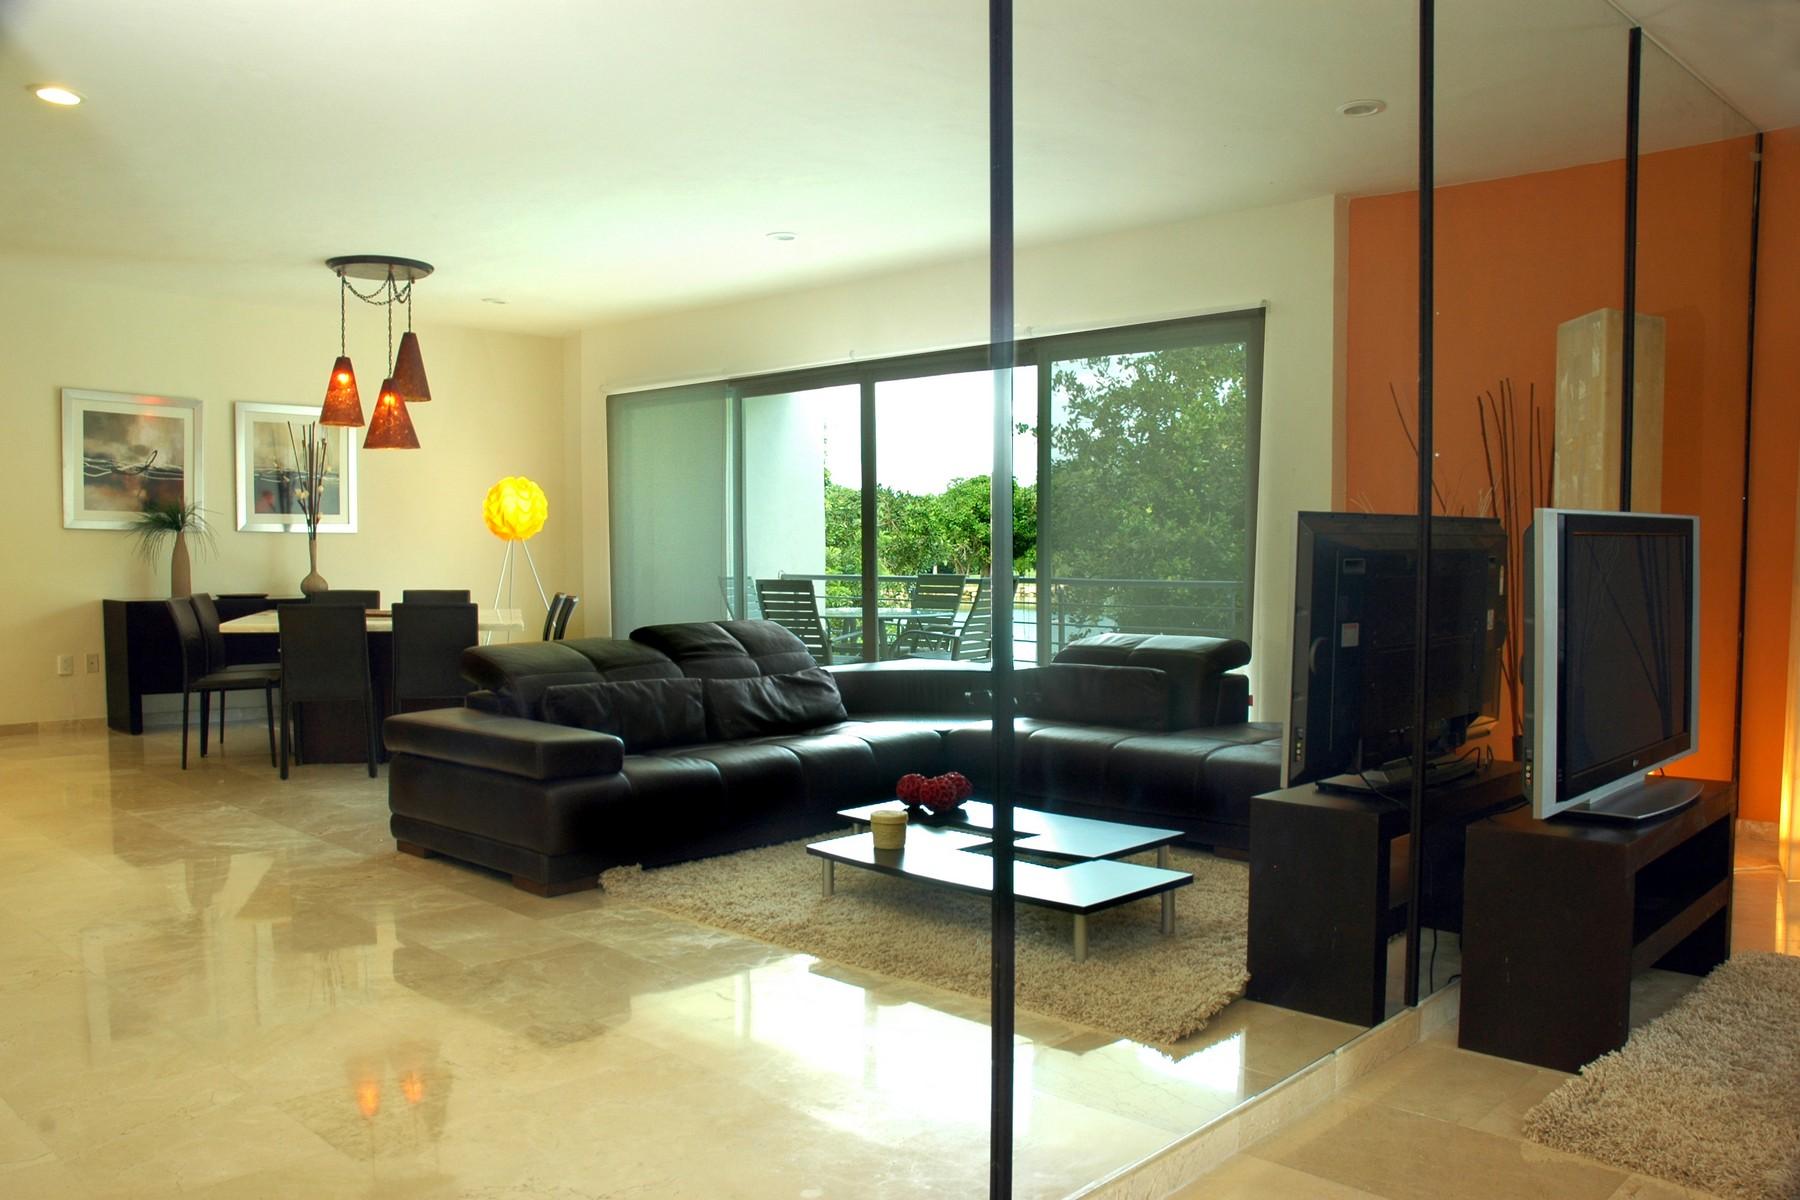 Additional photo for property listing at GOLF ONE C2 Golf One. Playacar Fase II Av. Xaman - Ha Lt. 1 Mza. 12 Playa Del Carmen, Quintana Roo 77710 Mexico